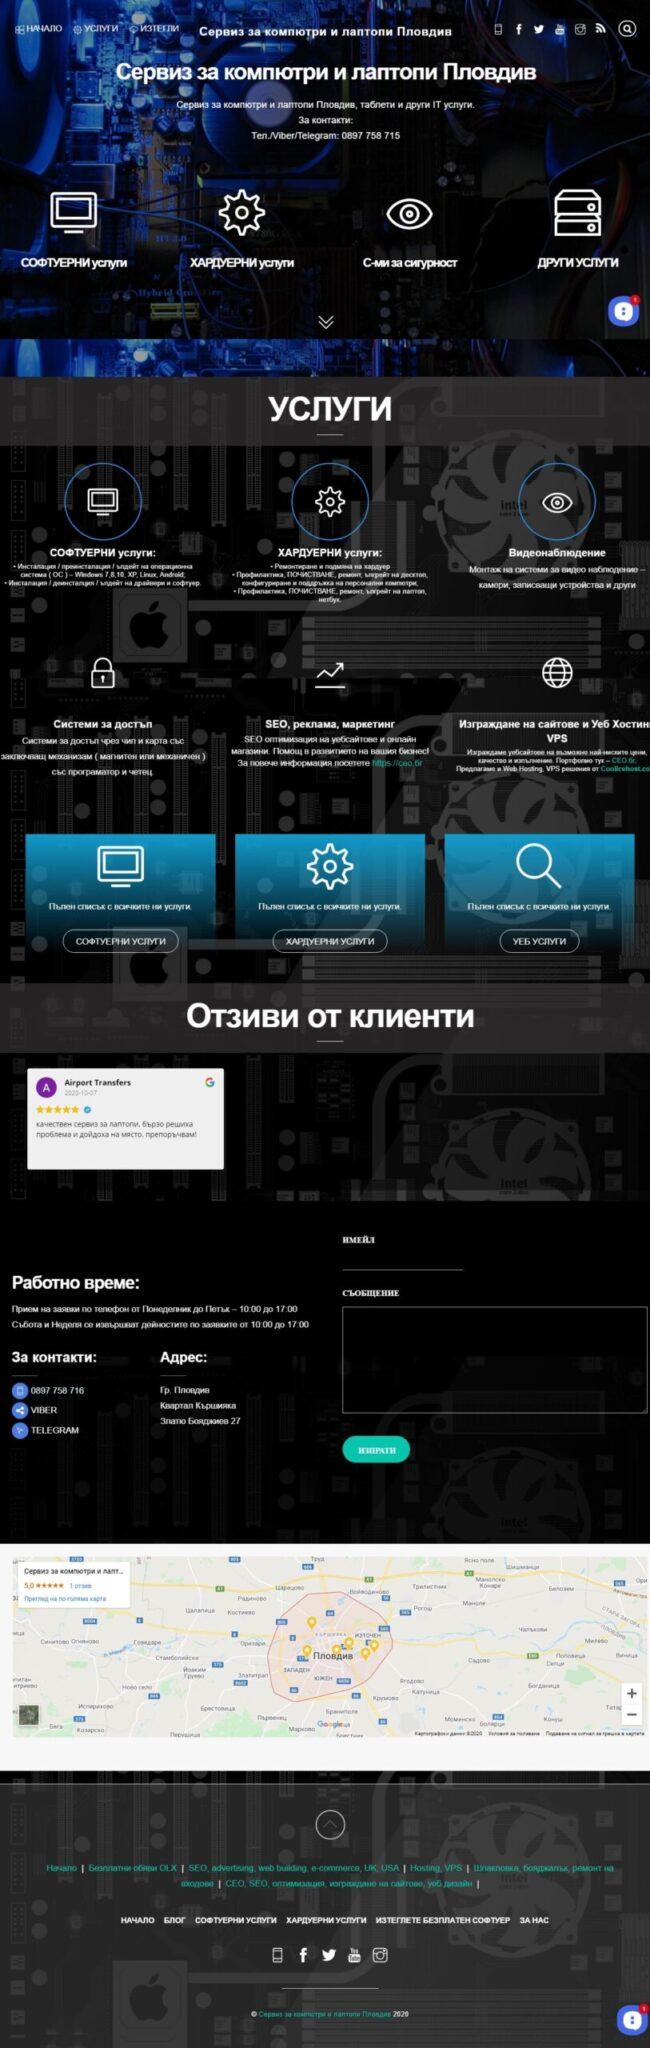 Plovdivpc.ml - Сервиз за компютри и лаптопи Пловдив - изграждане на сайт, SEO, WordPress